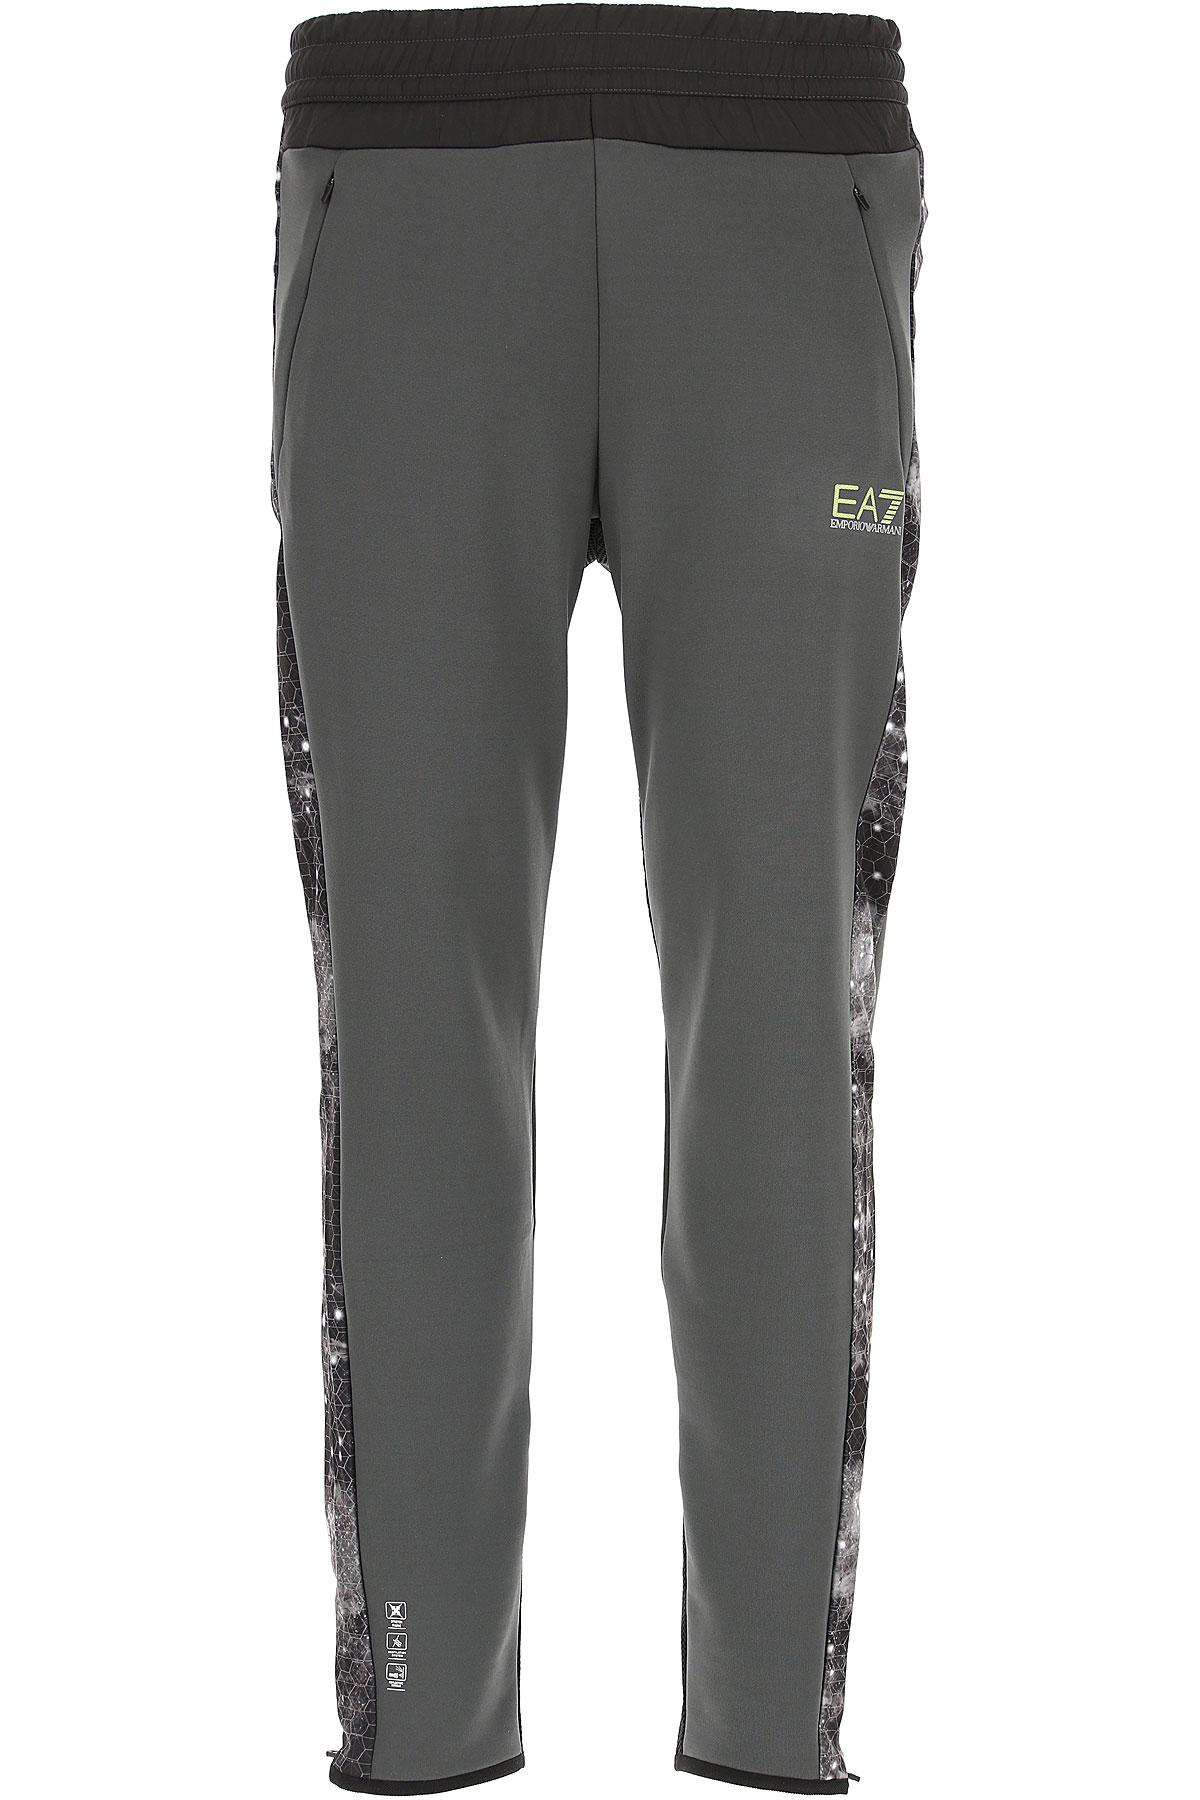 Emporio Armani Pantalon Homme Pas Cher En Soldes, Asphalte, Nylon, 2019, L S XL